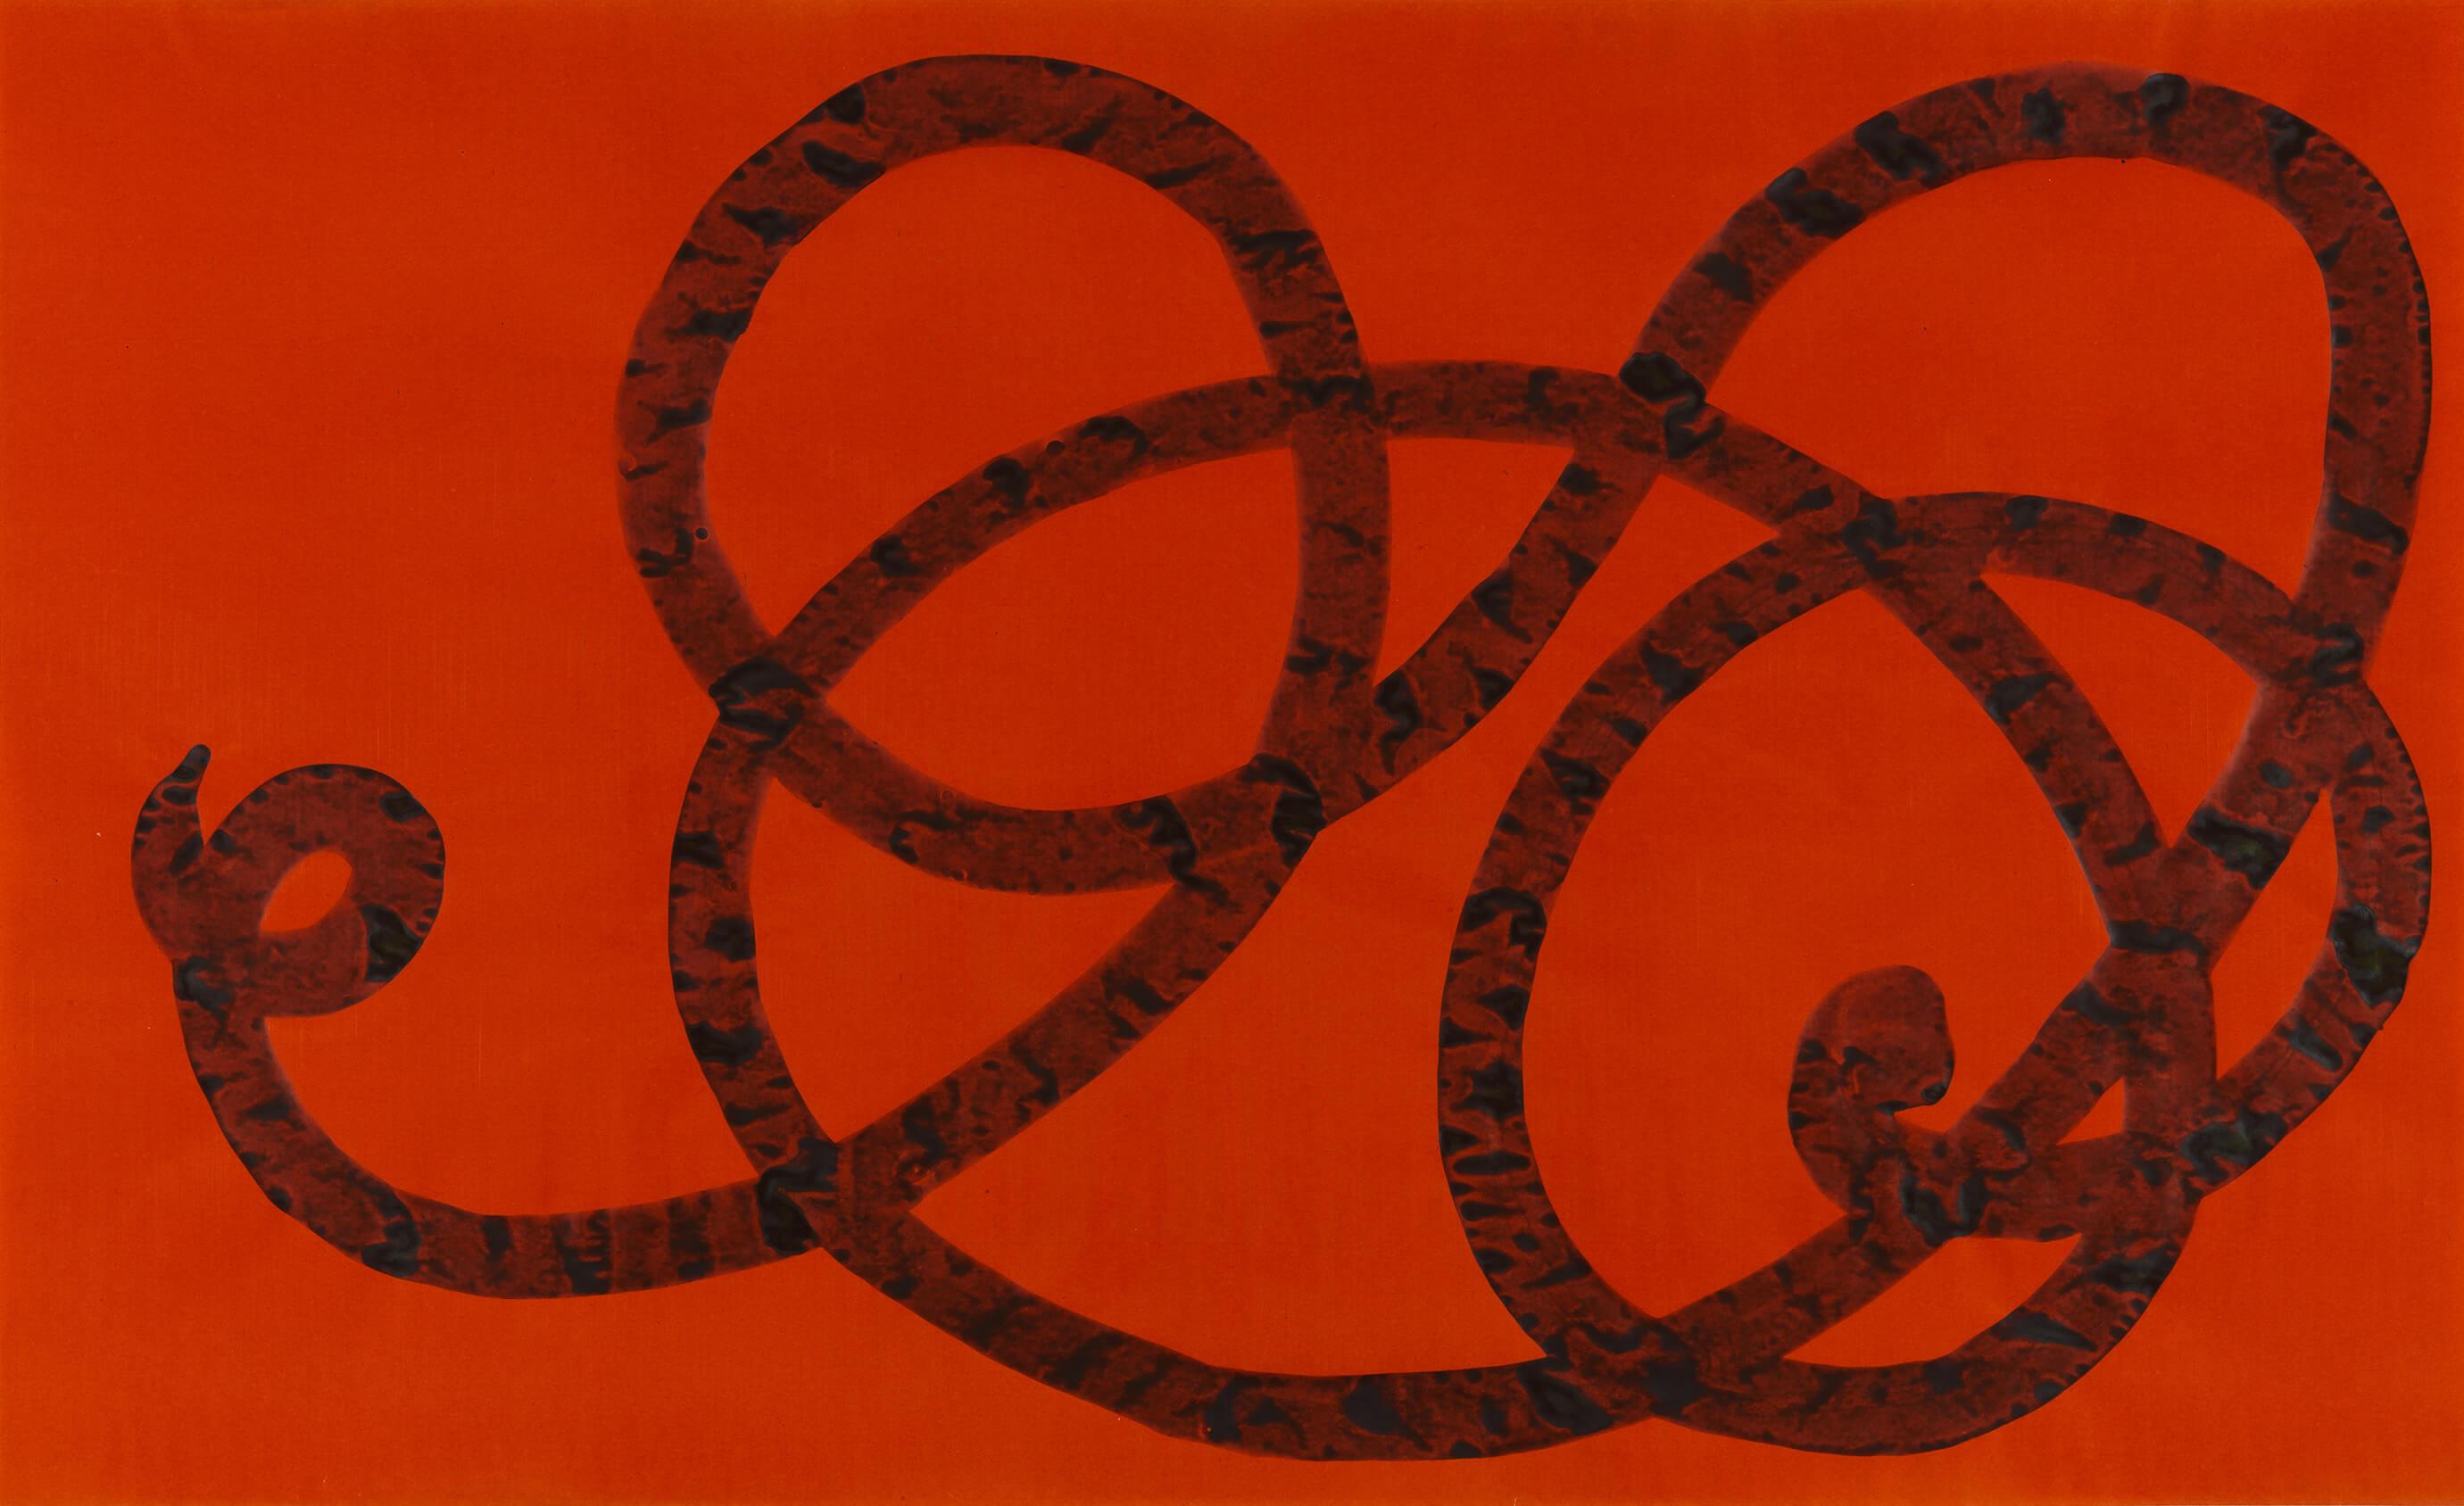 Schlangenlinien_Blatt_07_428mm_x_793mm_0001